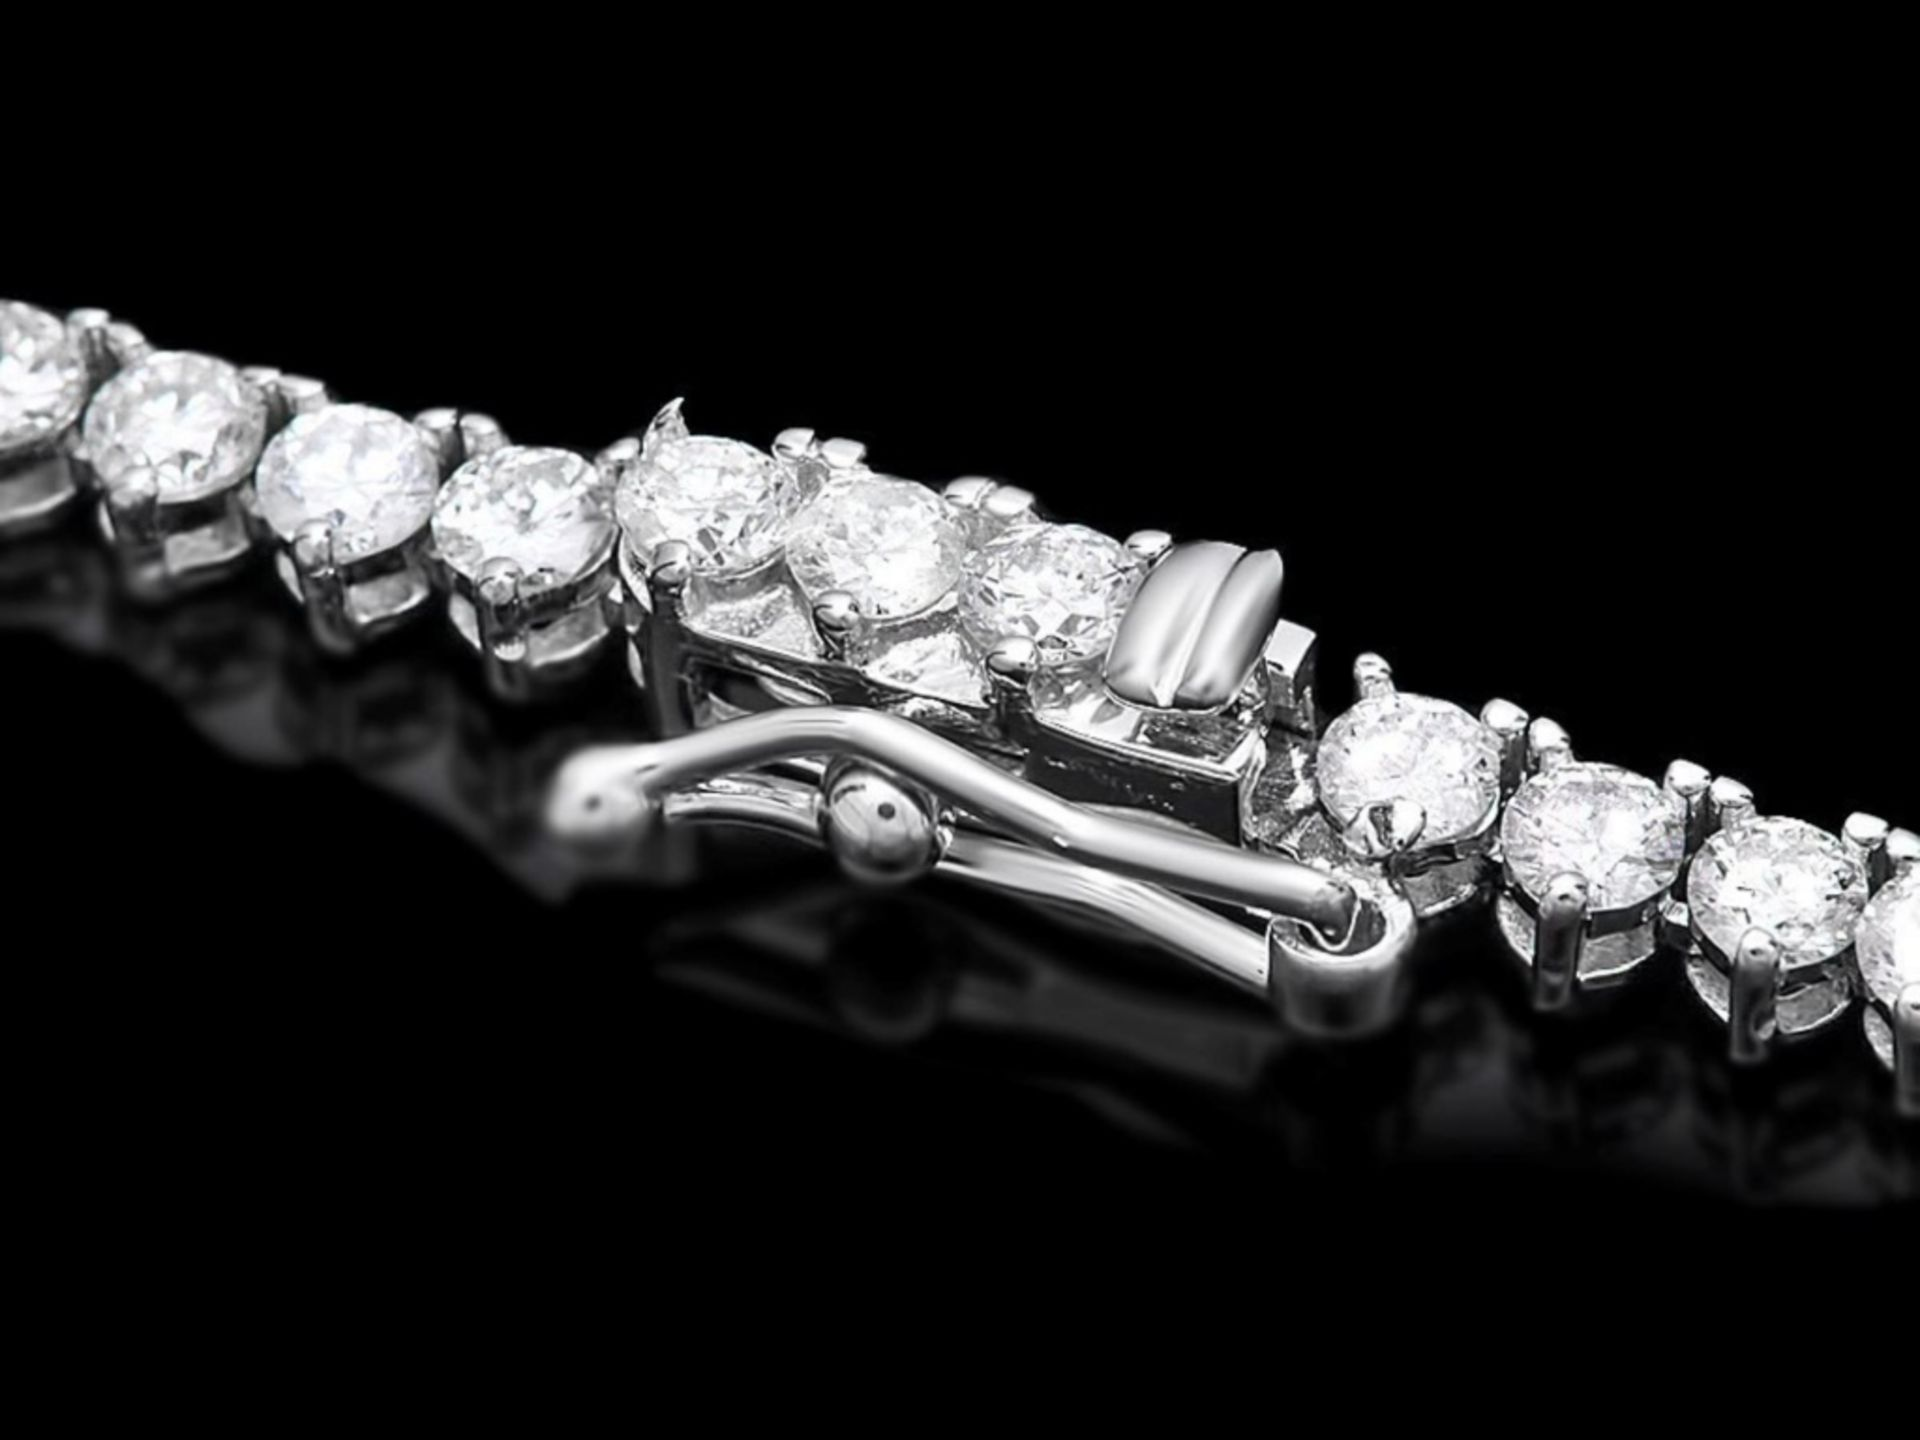 ^18k White Gold 9.00ct Diamond Necklace - Image 4 of 5